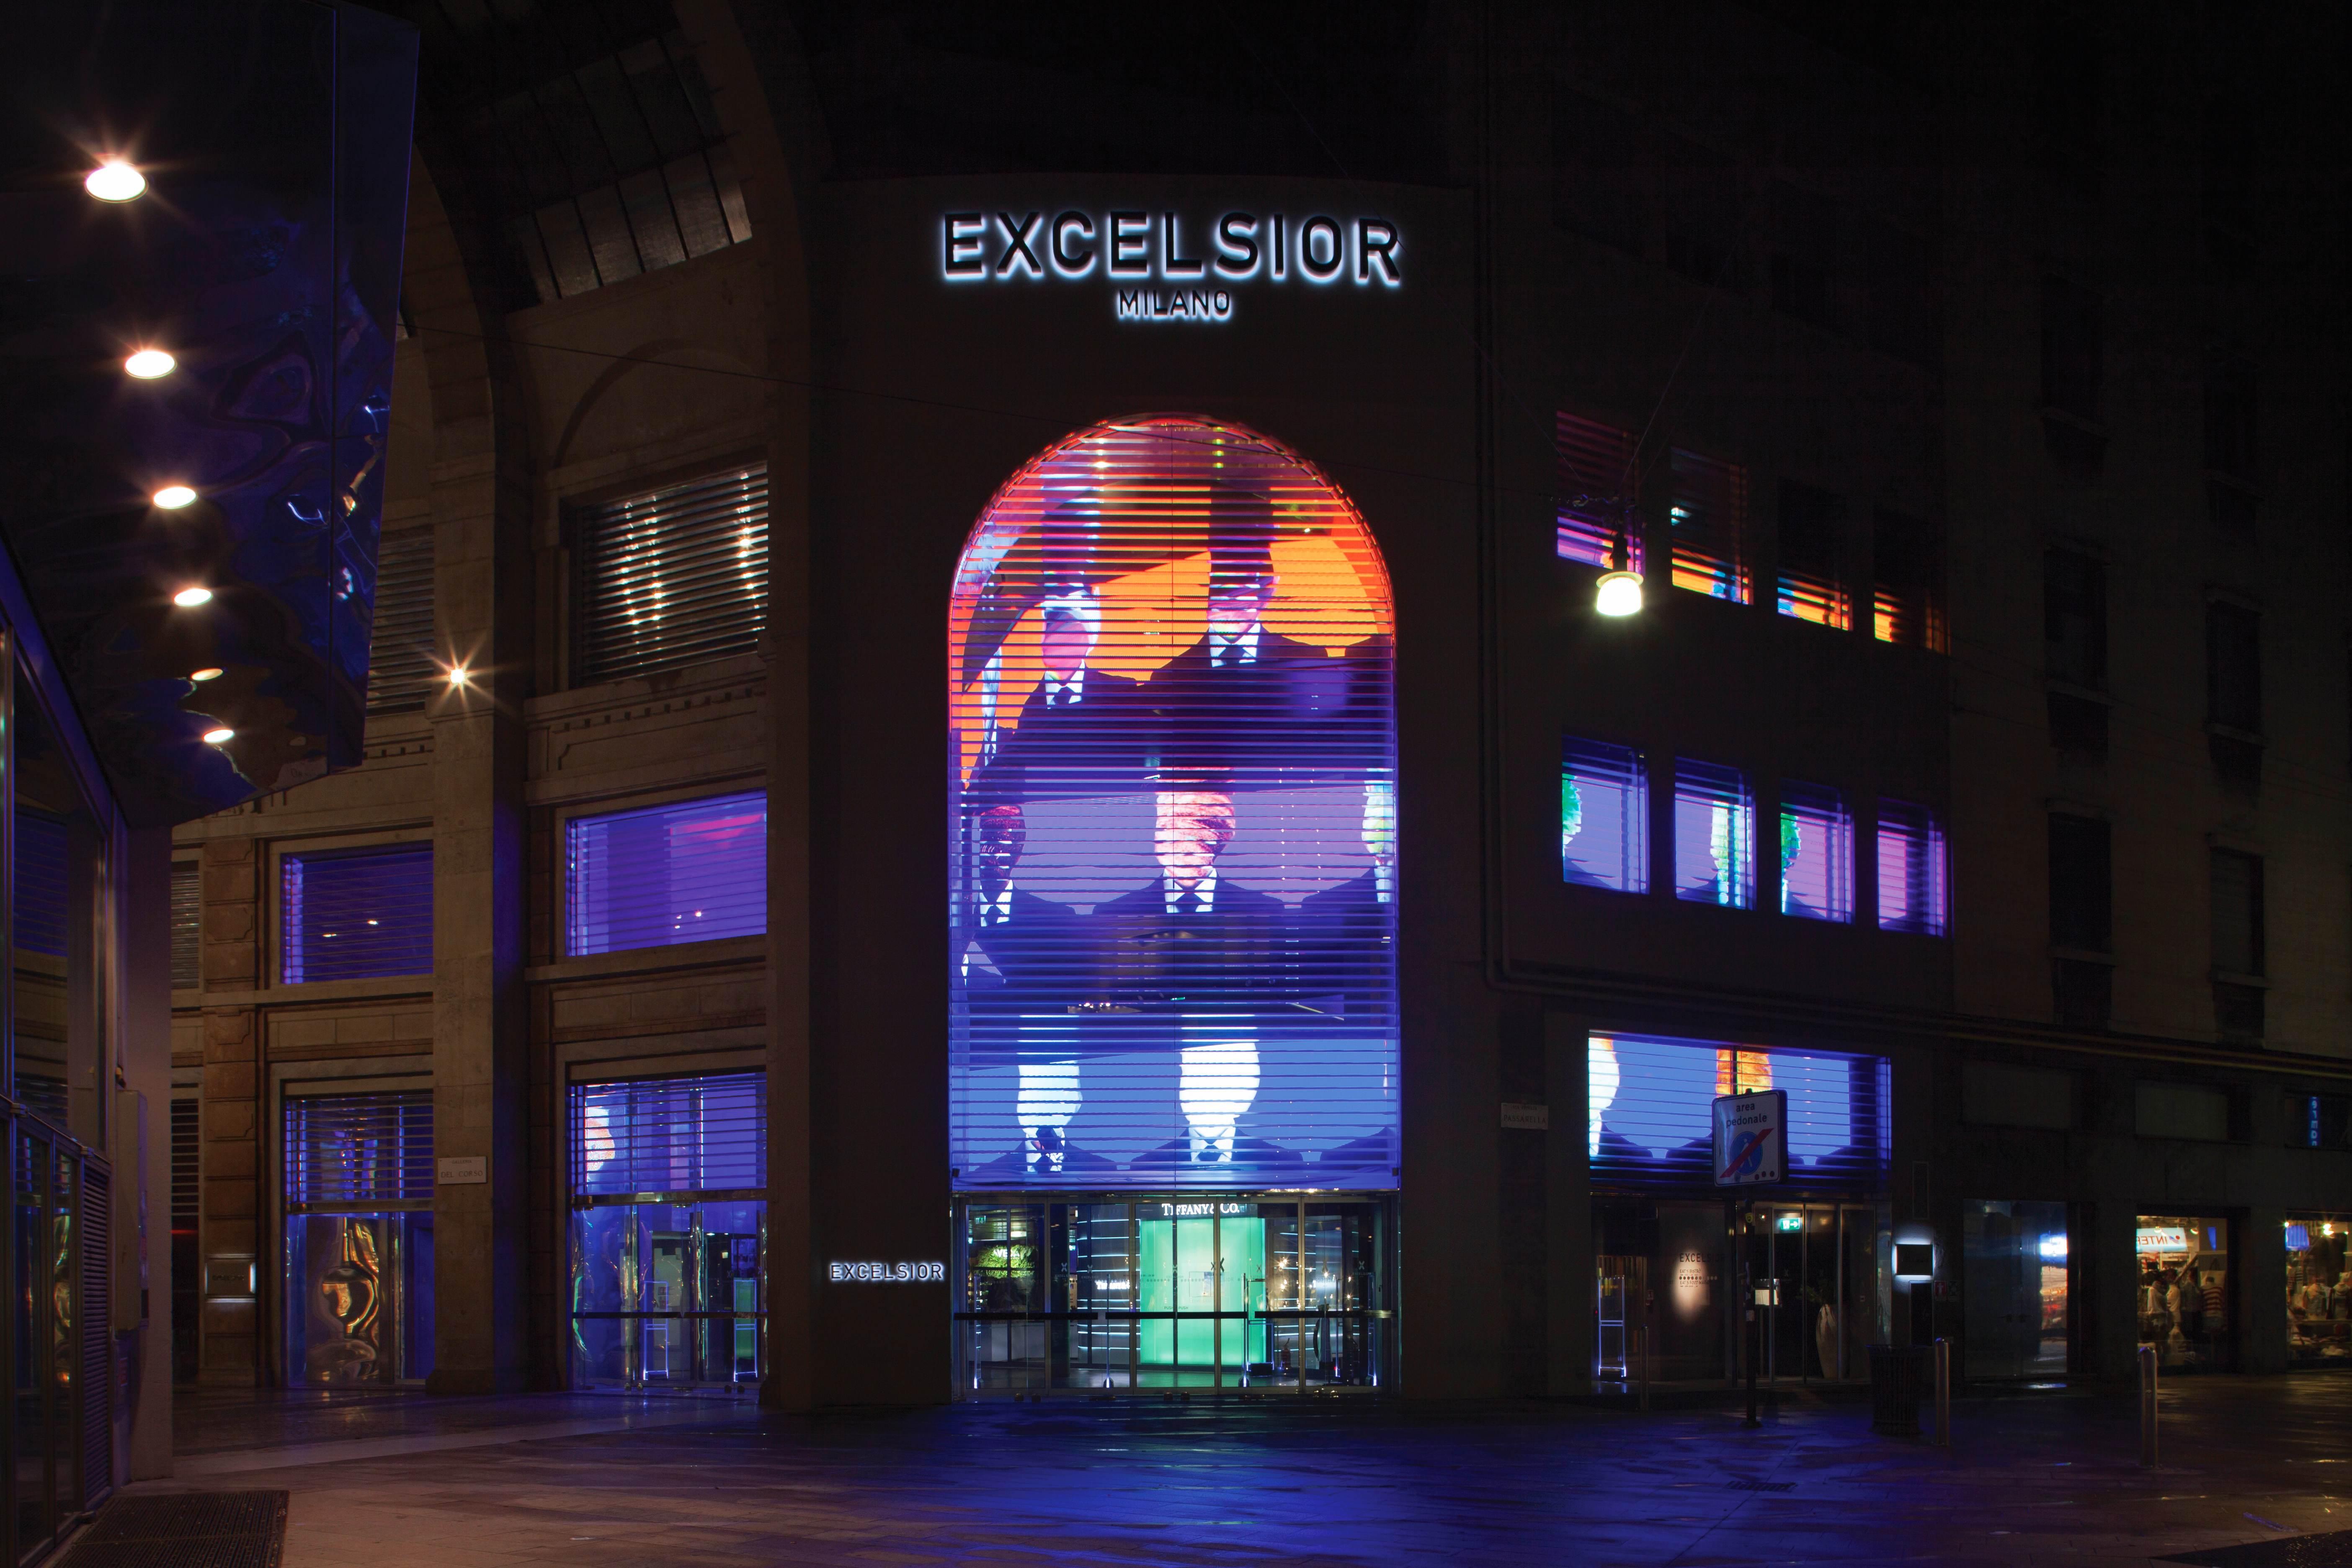 Excelsior Milano.